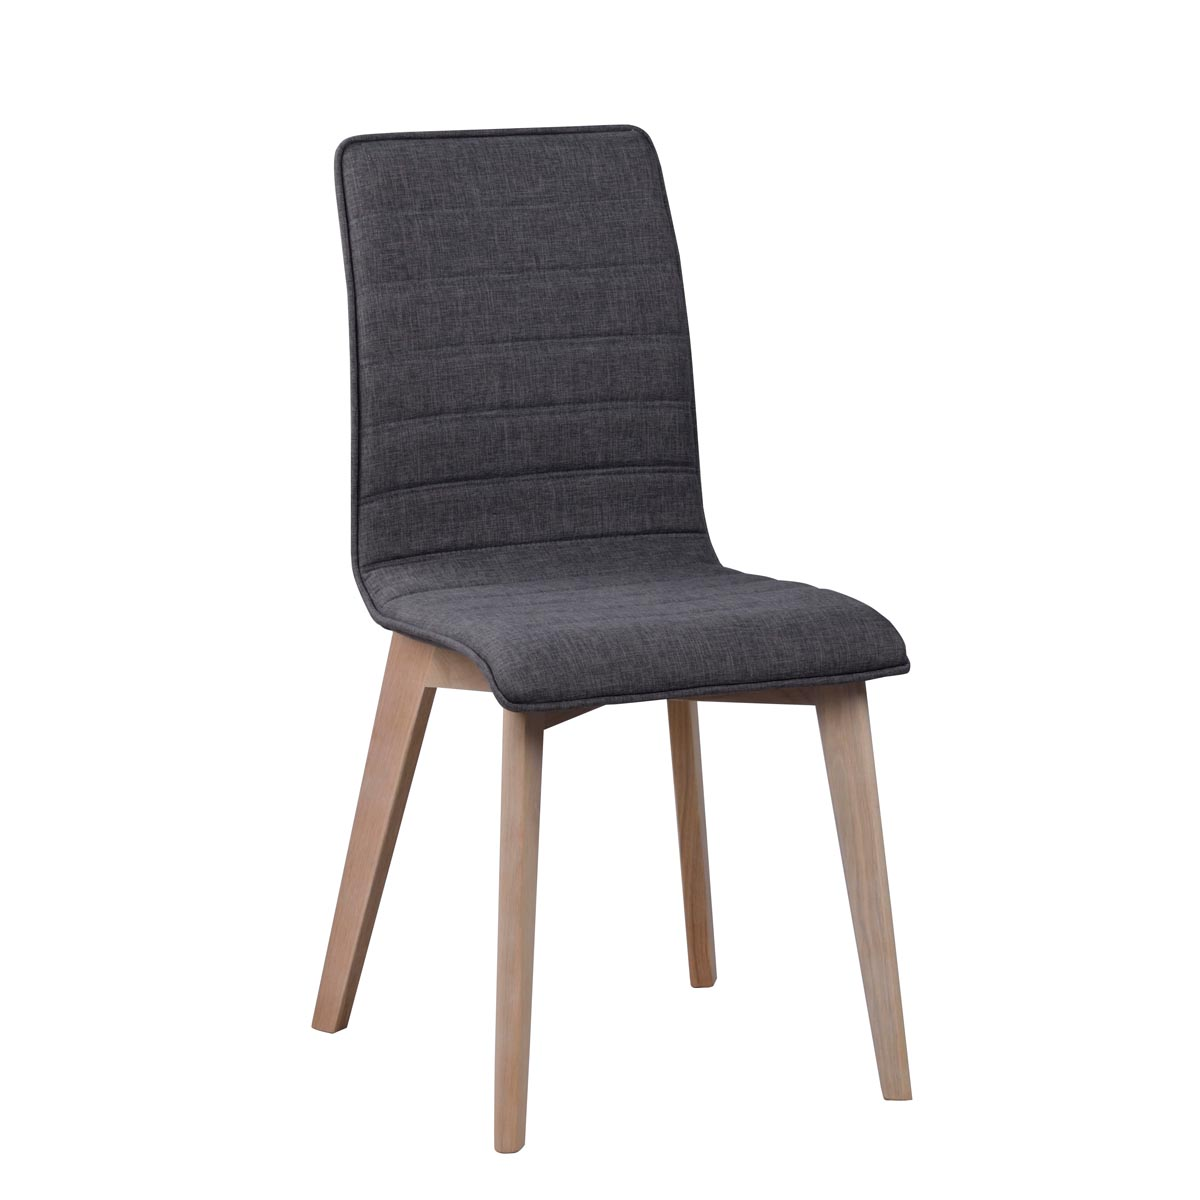 Febe-stol-morkgra-tyg-ww-Grace-113640